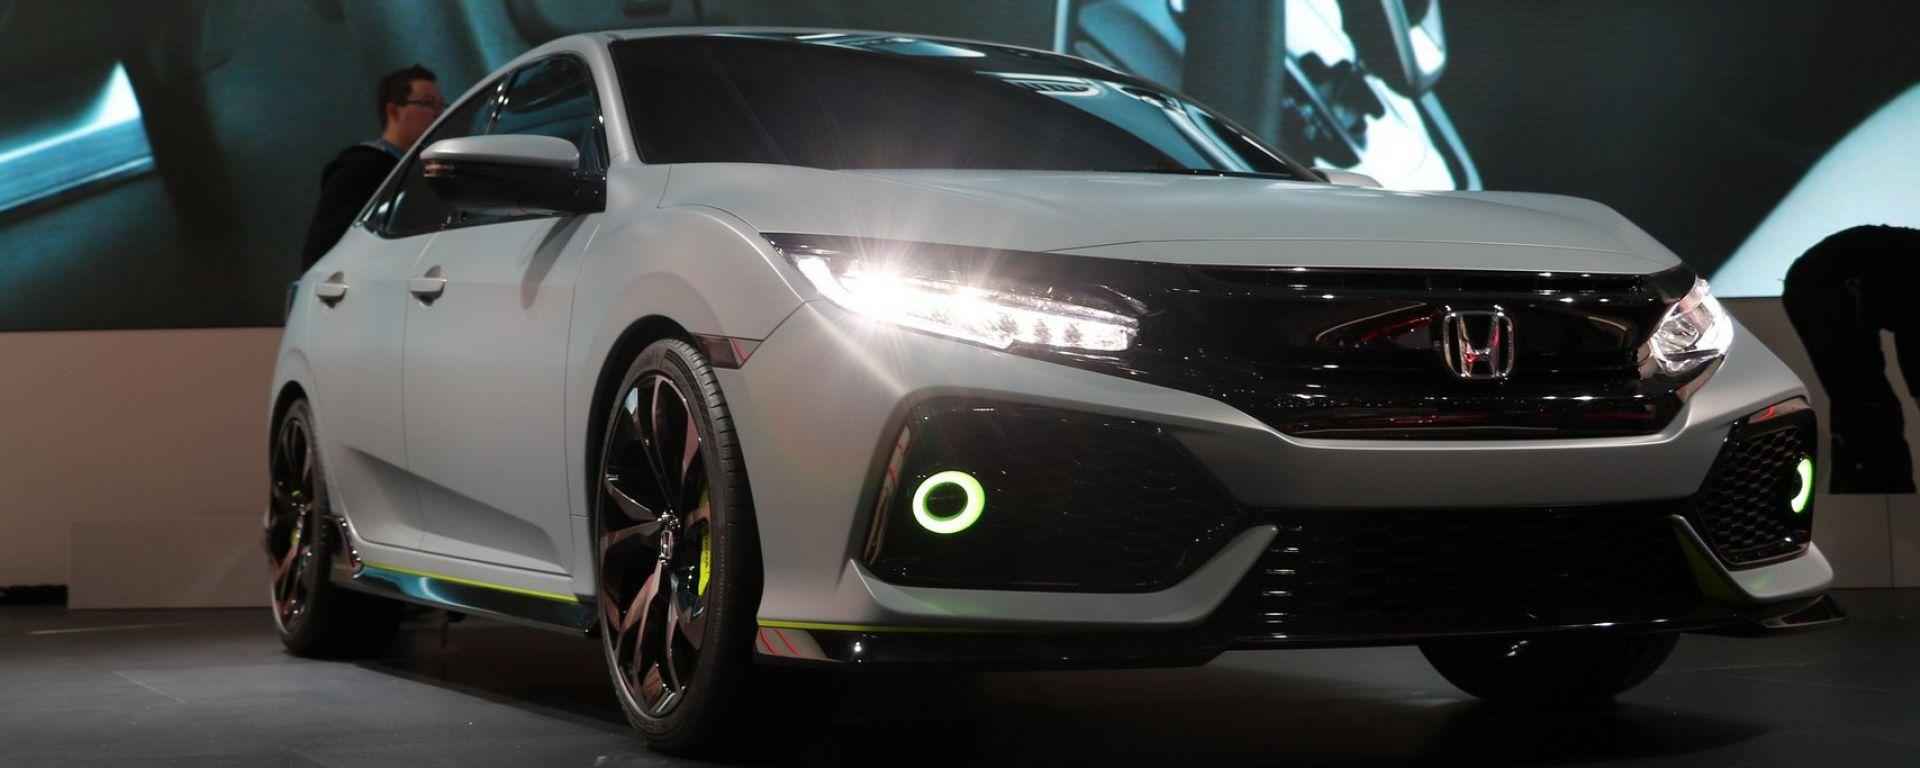 Ginevra 2016 - Notizie dalle Case: Honda